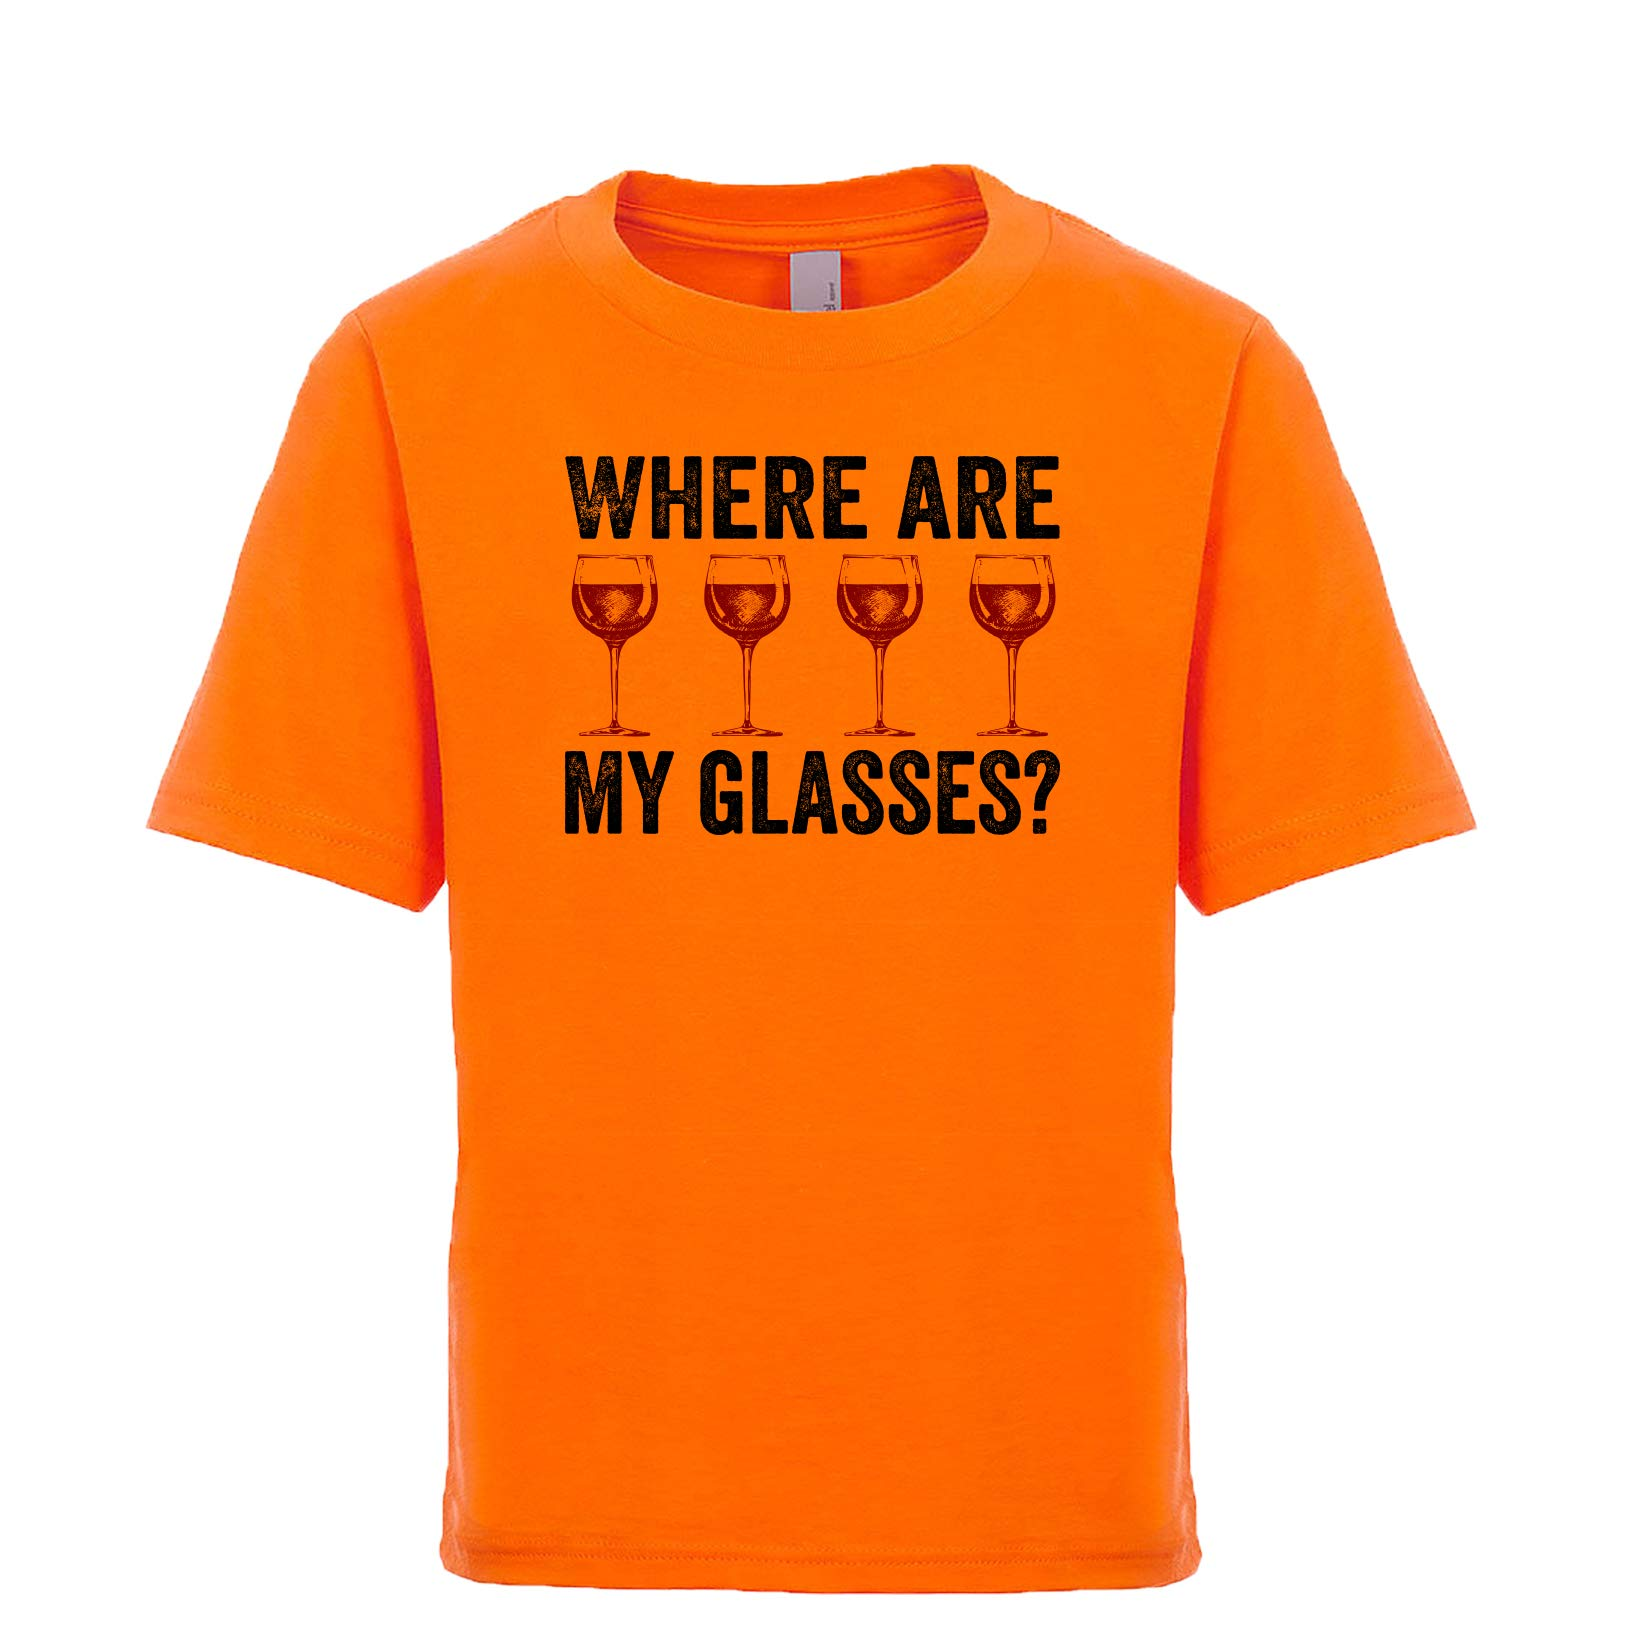 Shirtgoals Where are My Glasses? Unisex Kids Tee Orange Large